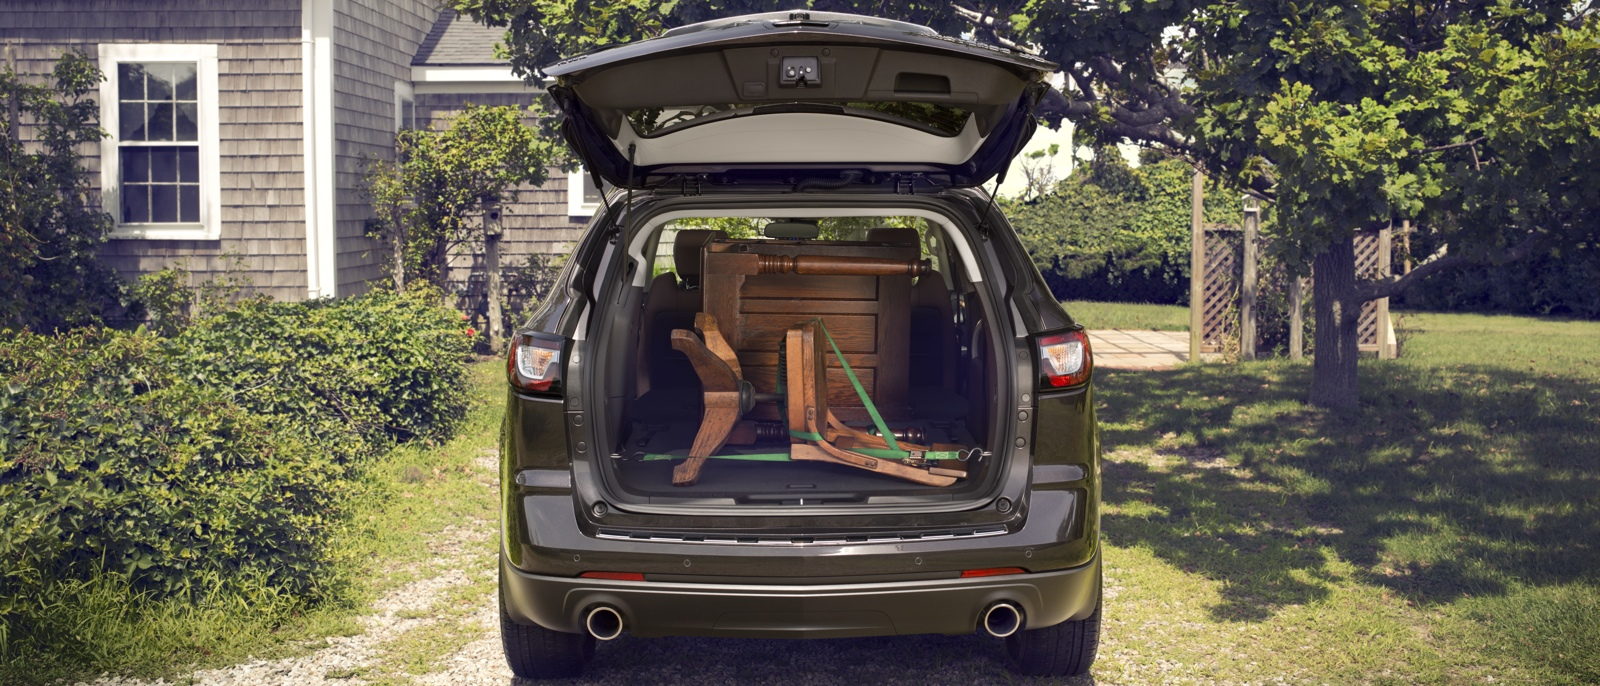 2015 Chevy Traverse